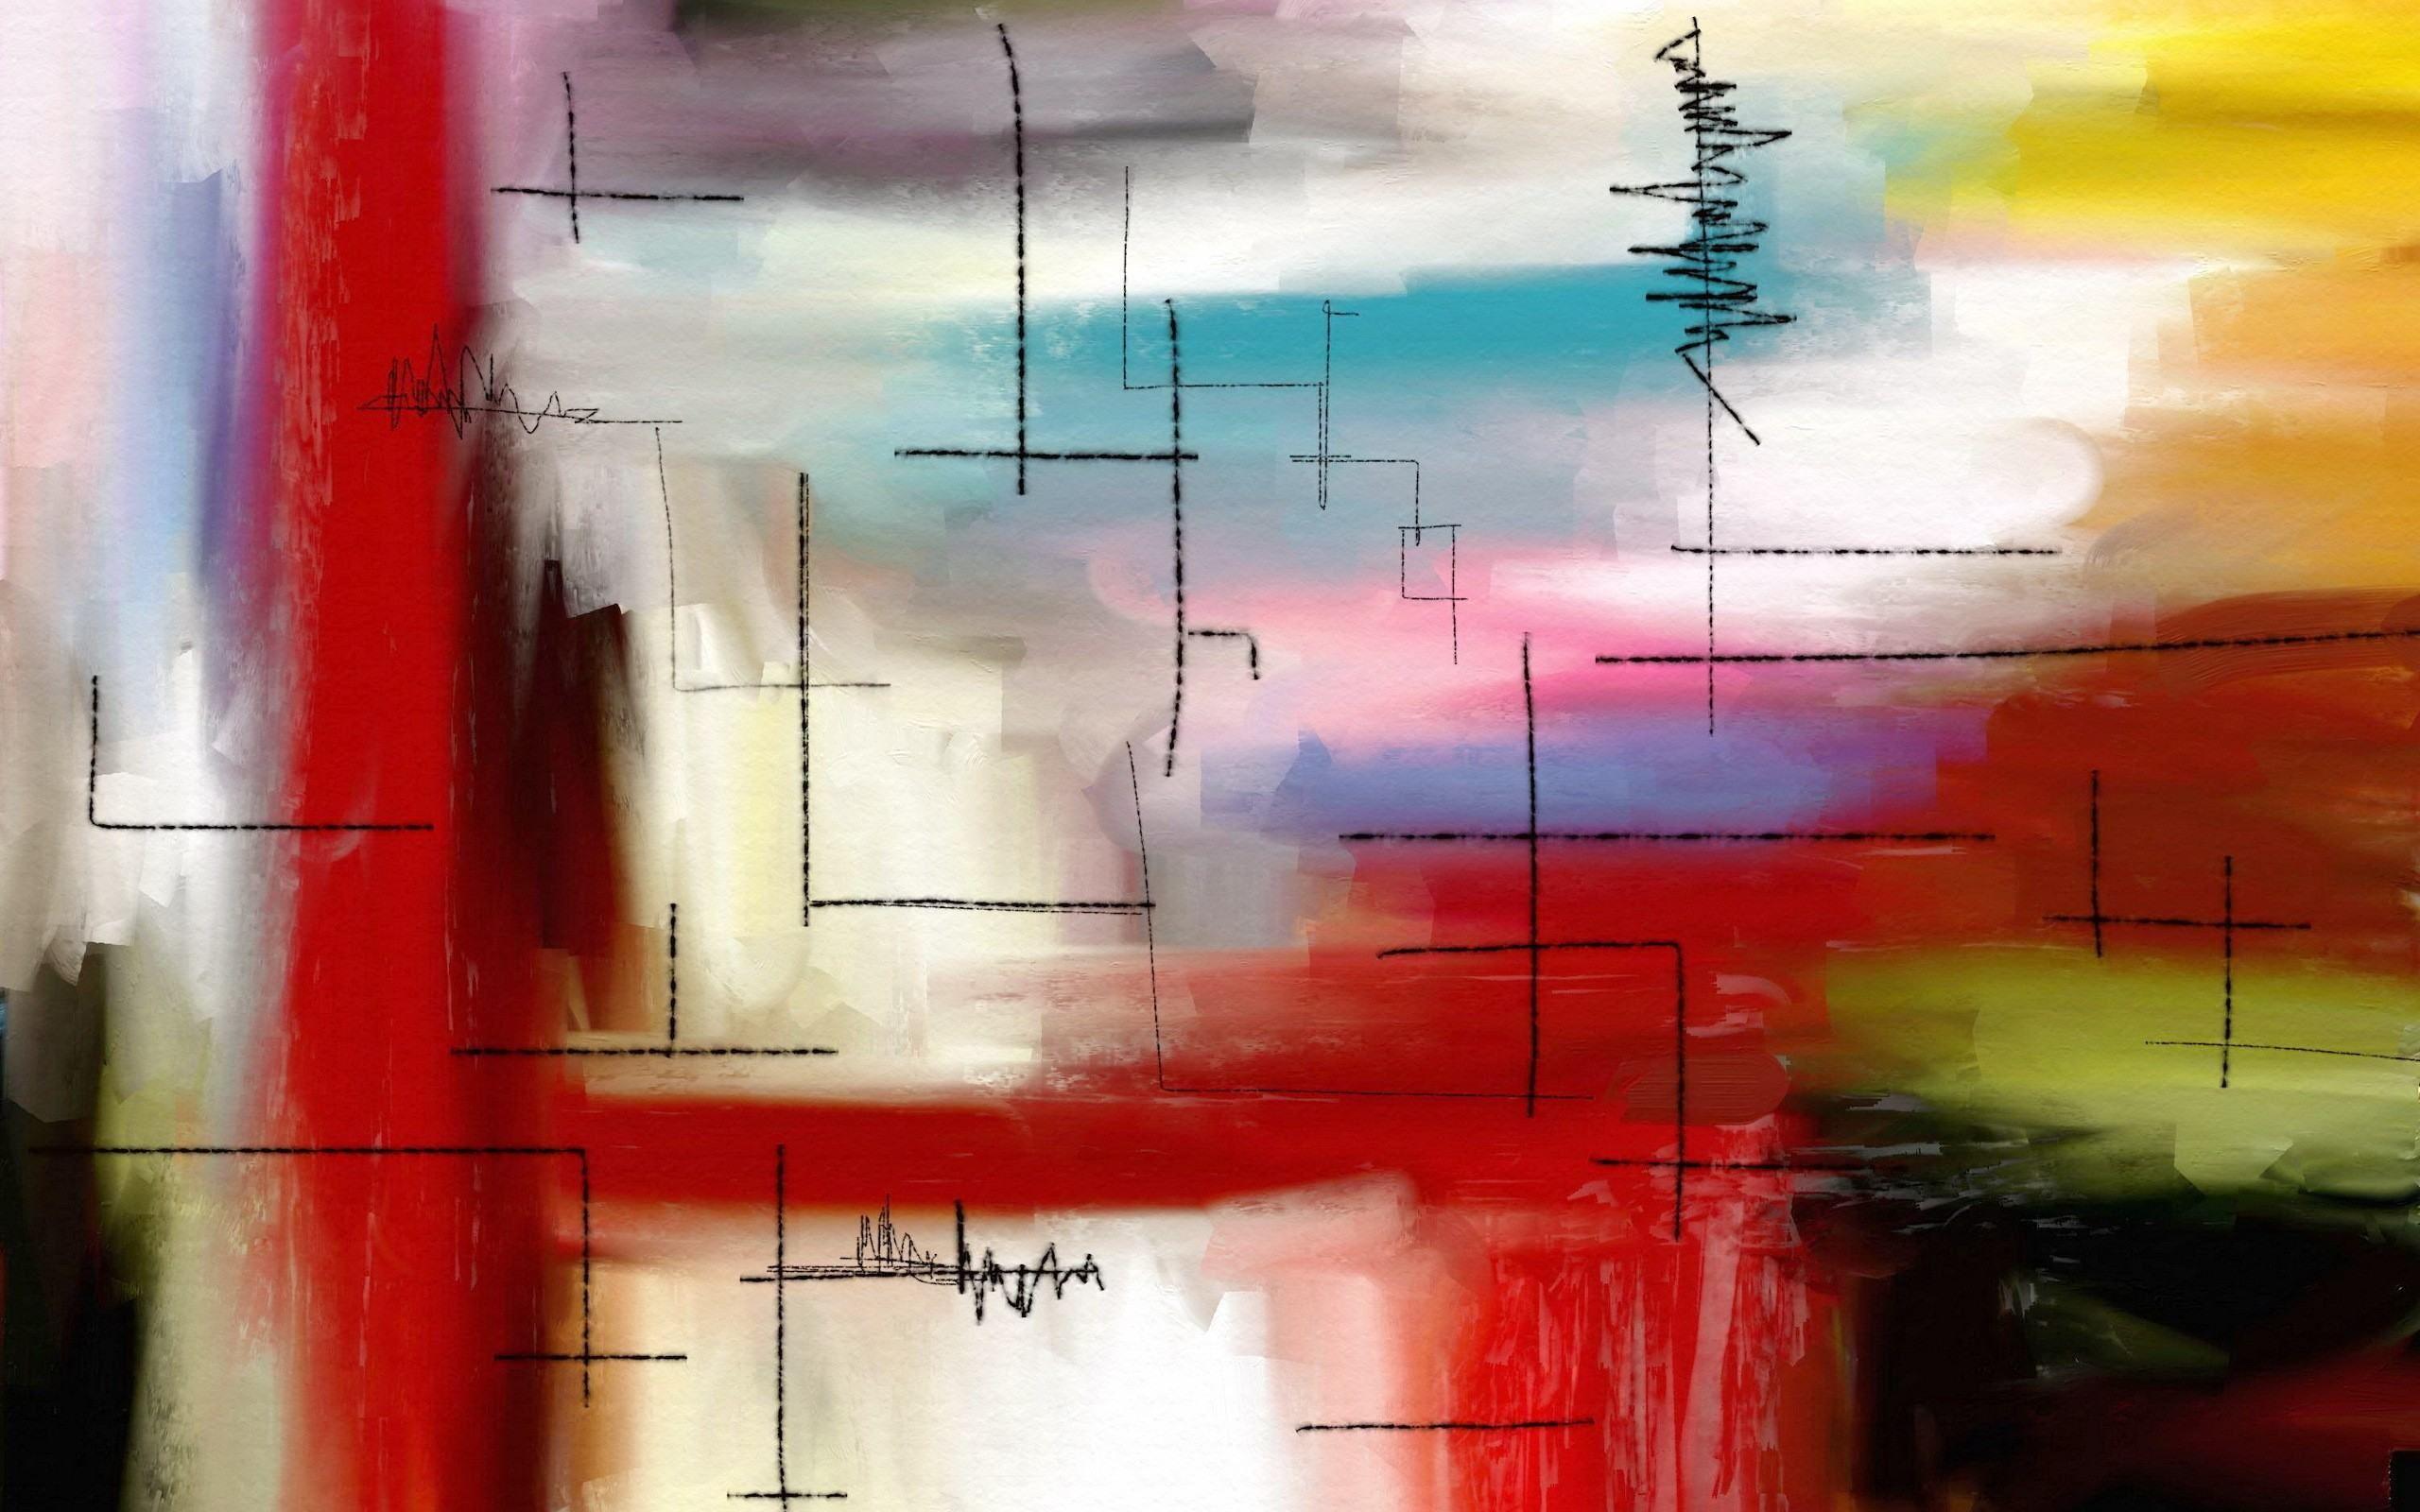 Modern Art Gallery Hd Wallpapers Abstract Art Images Painting Wallpaper Artistic Wallpaper